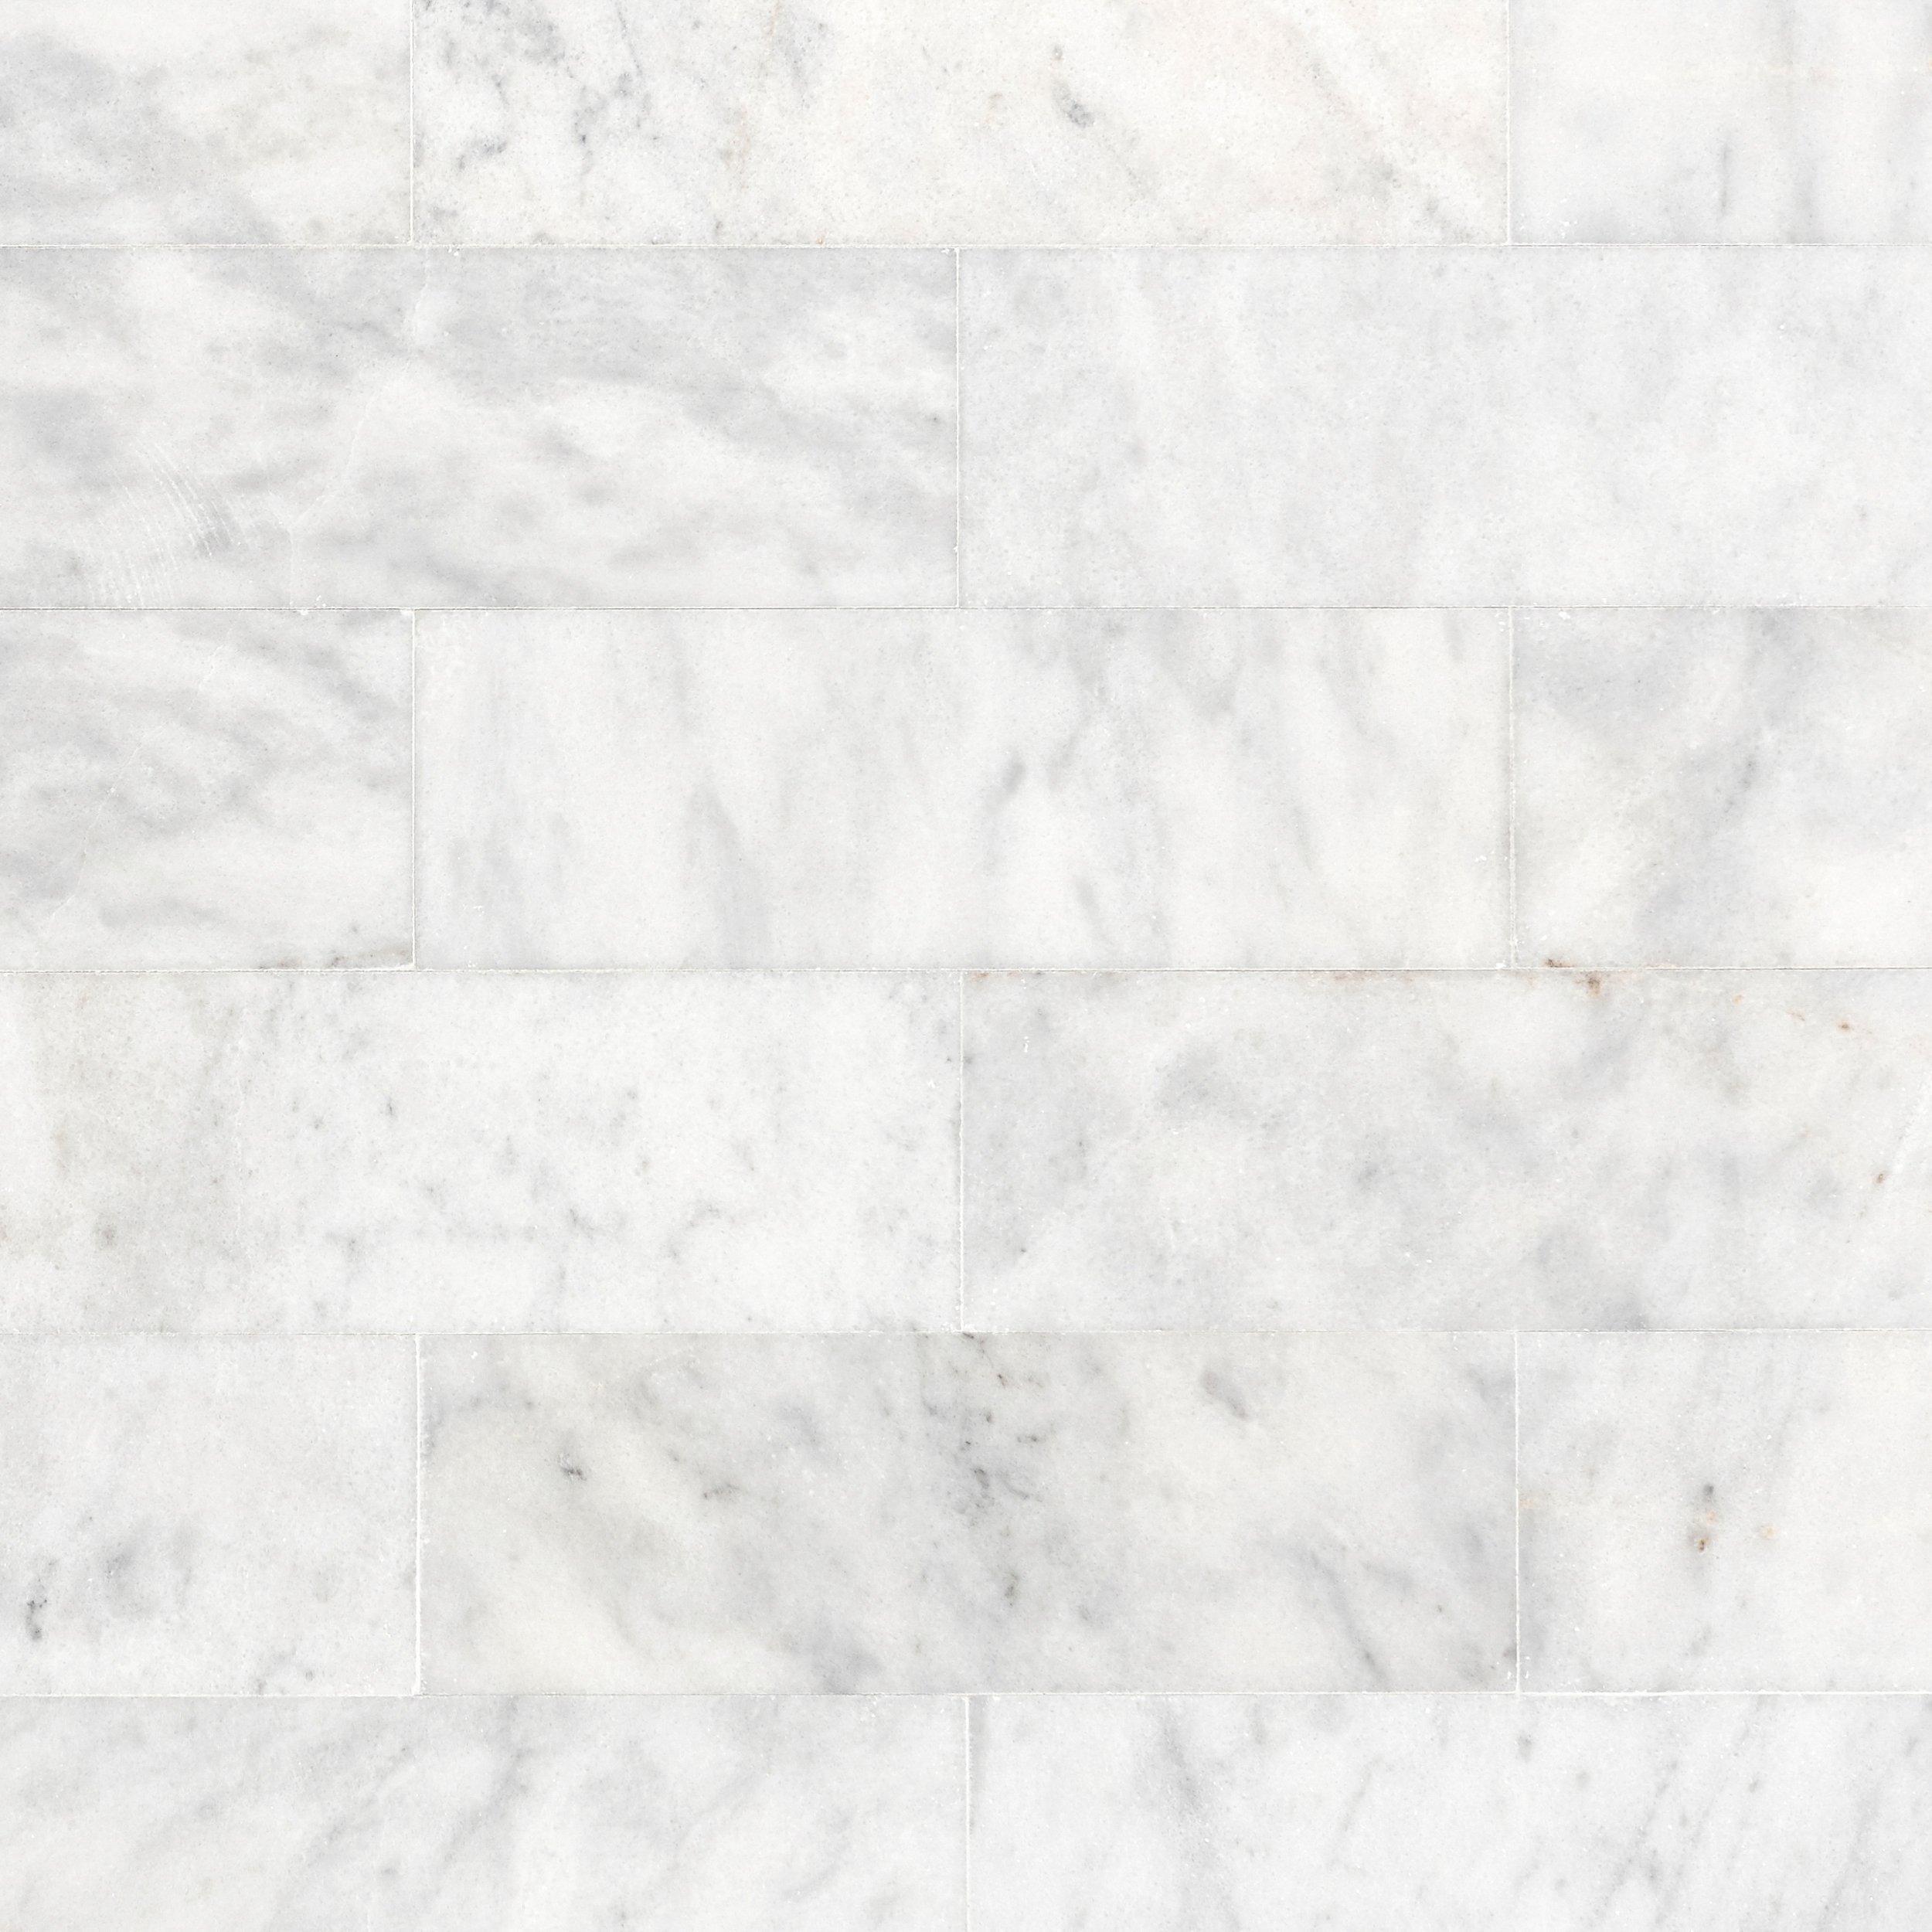 Carrara Milano Polished Marble Tile Floor Decor In 2020 Polished Marble Tiles Honed Marble Tiles Carrara Marble Tile